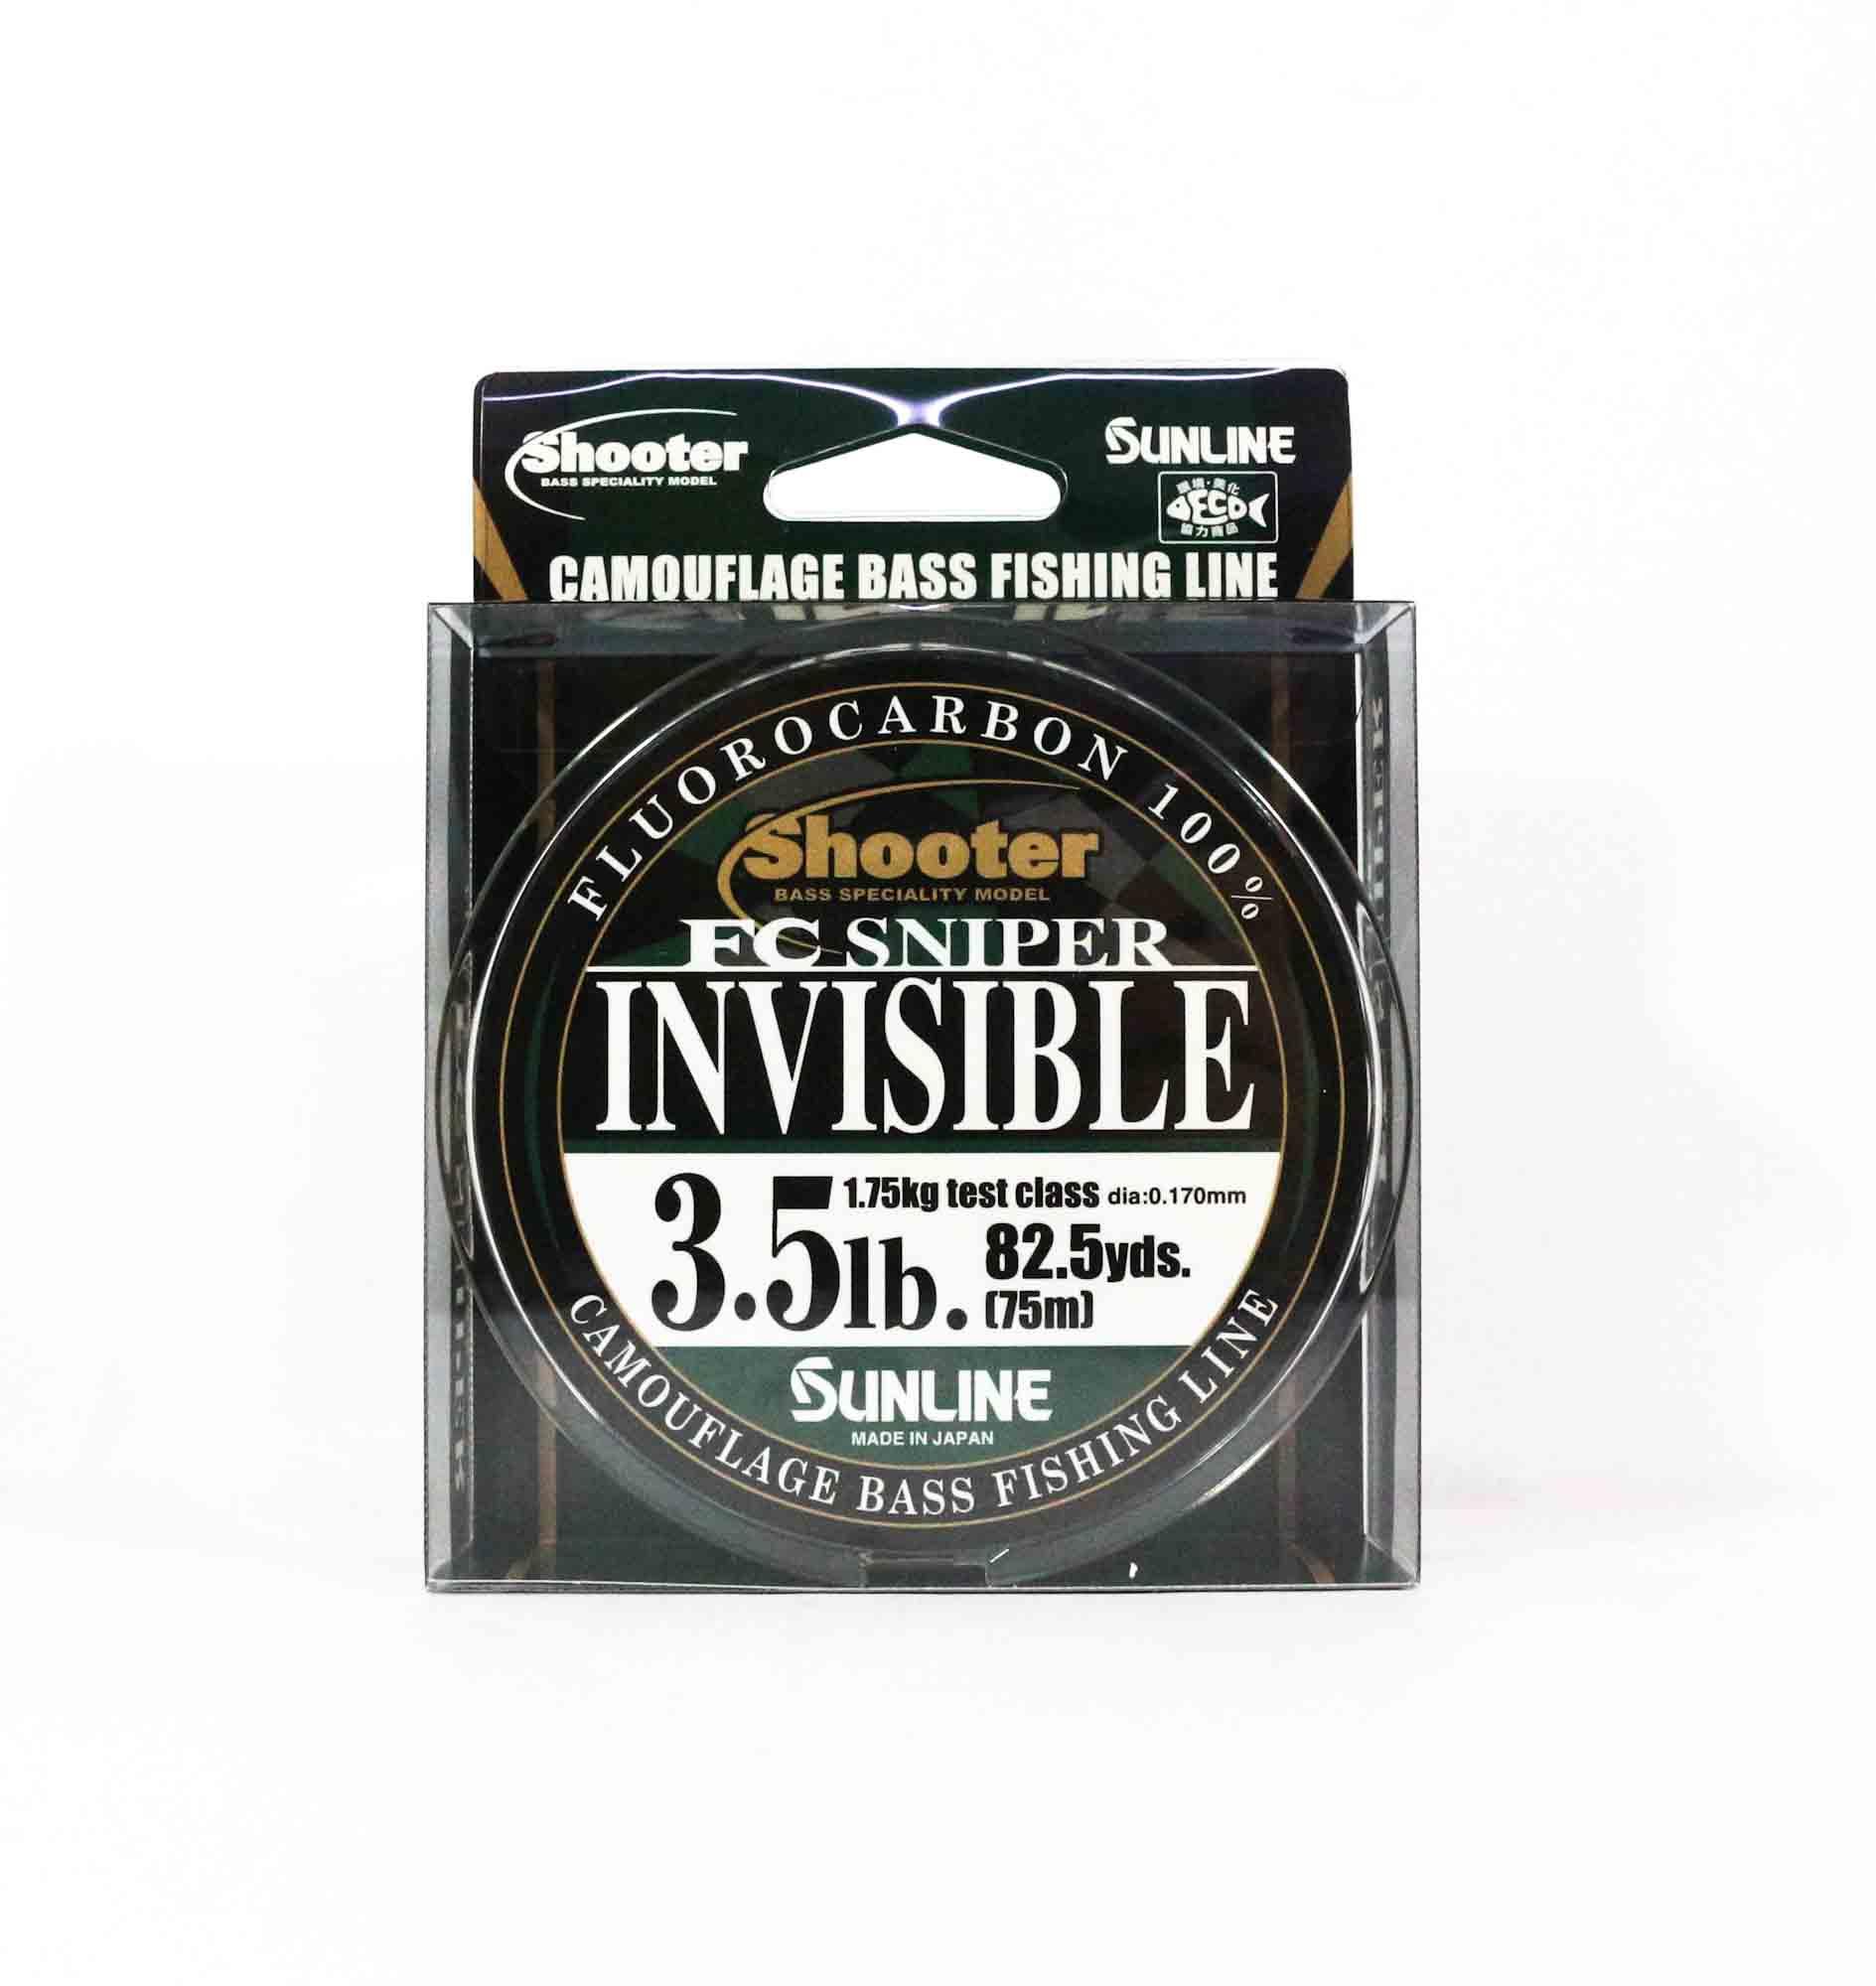 Sunline Fluorocarbon Line FC Sniper Invisible 75m 3.5lb 0.17mm (2131)